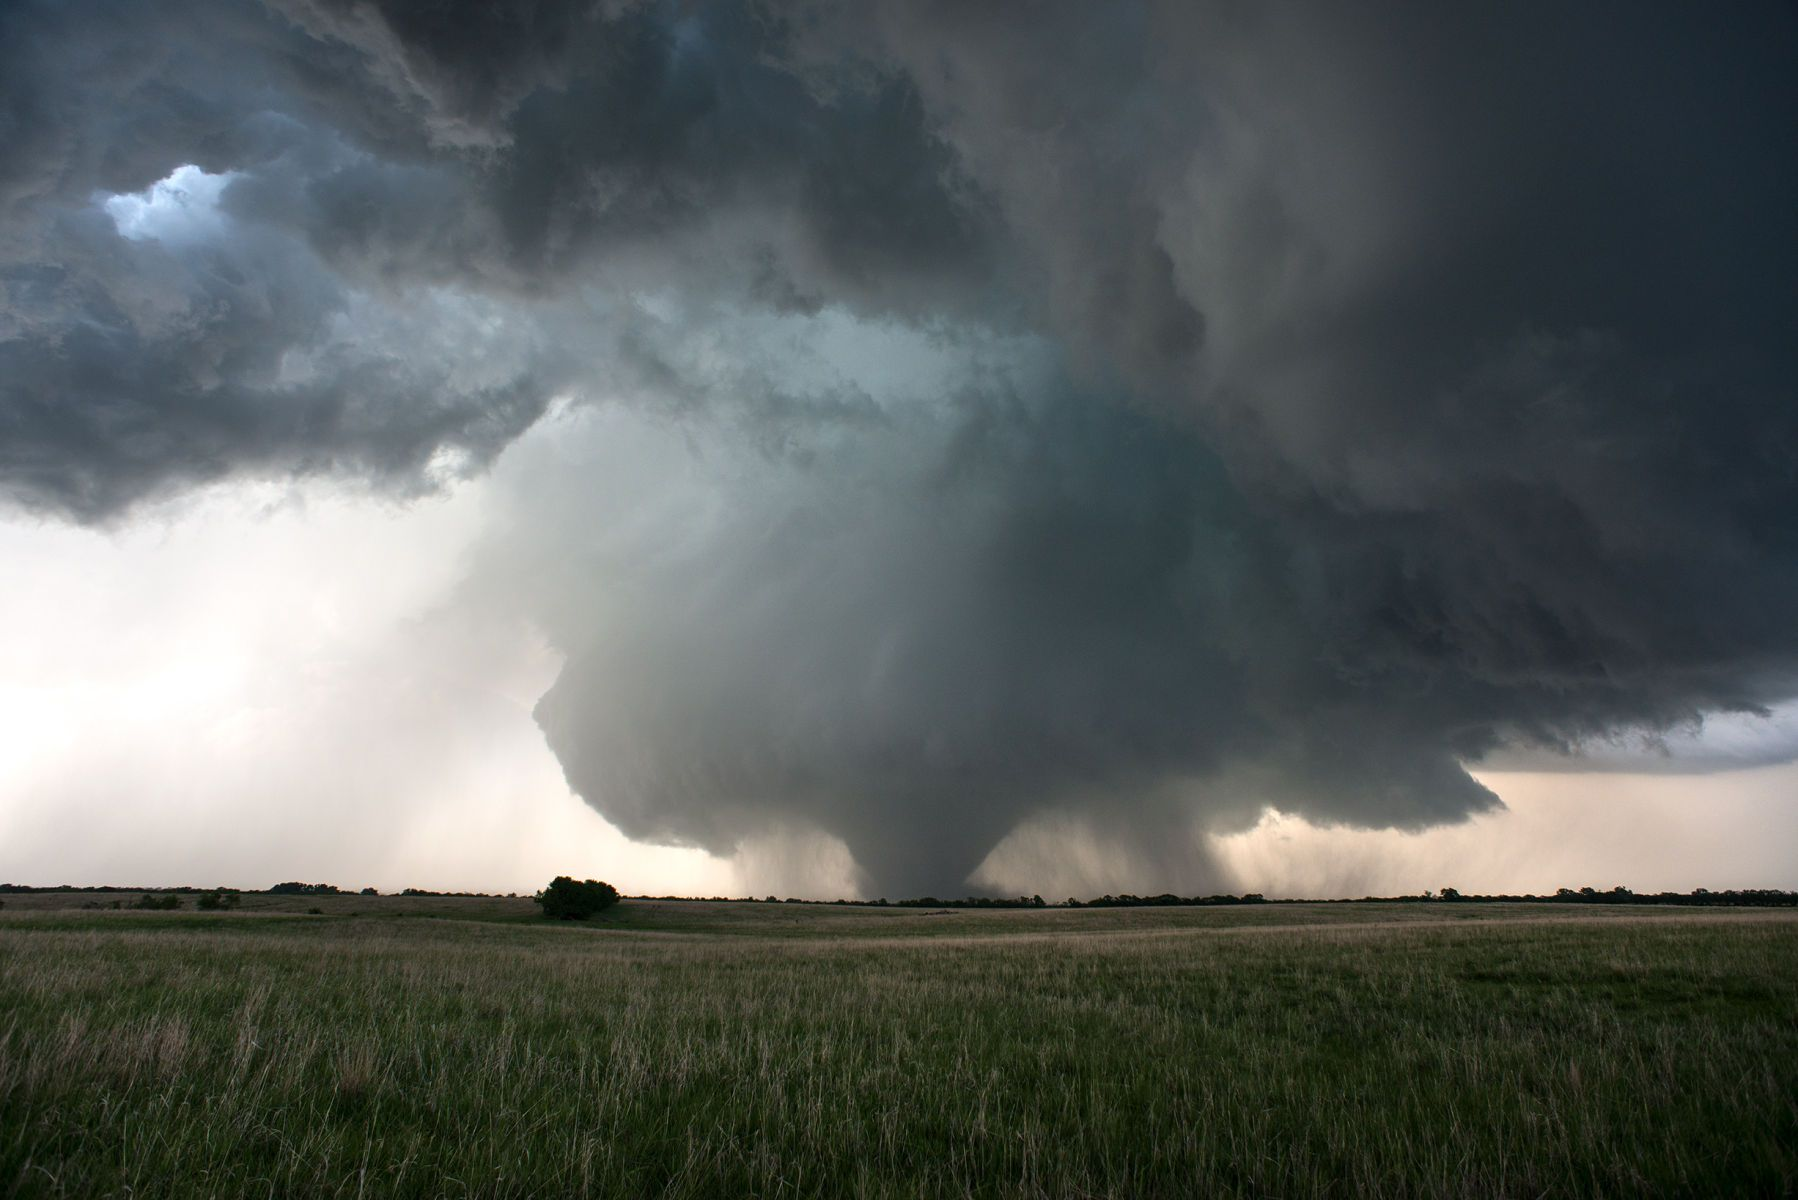 cmredwine, cameron redwine, tornado, photograhy, weather